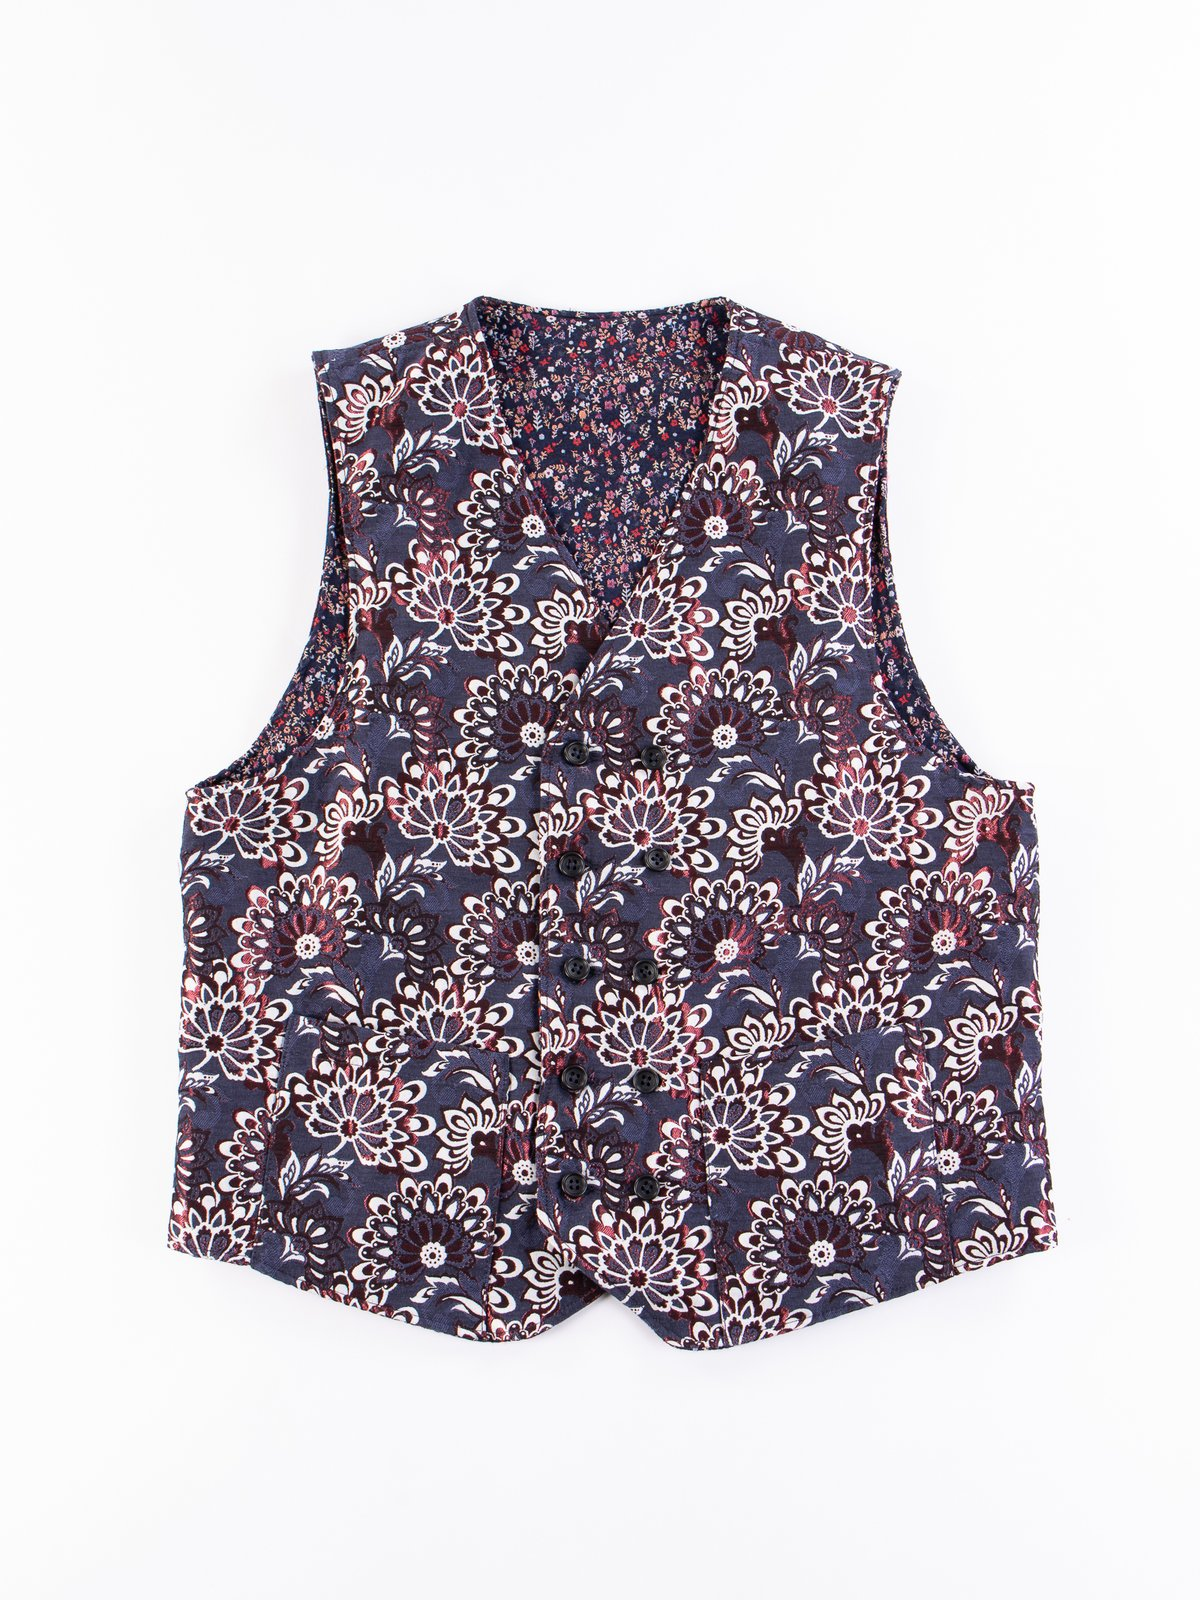 Navy Polyester Mini Floral Jacquard Reversible Vest - Image 5